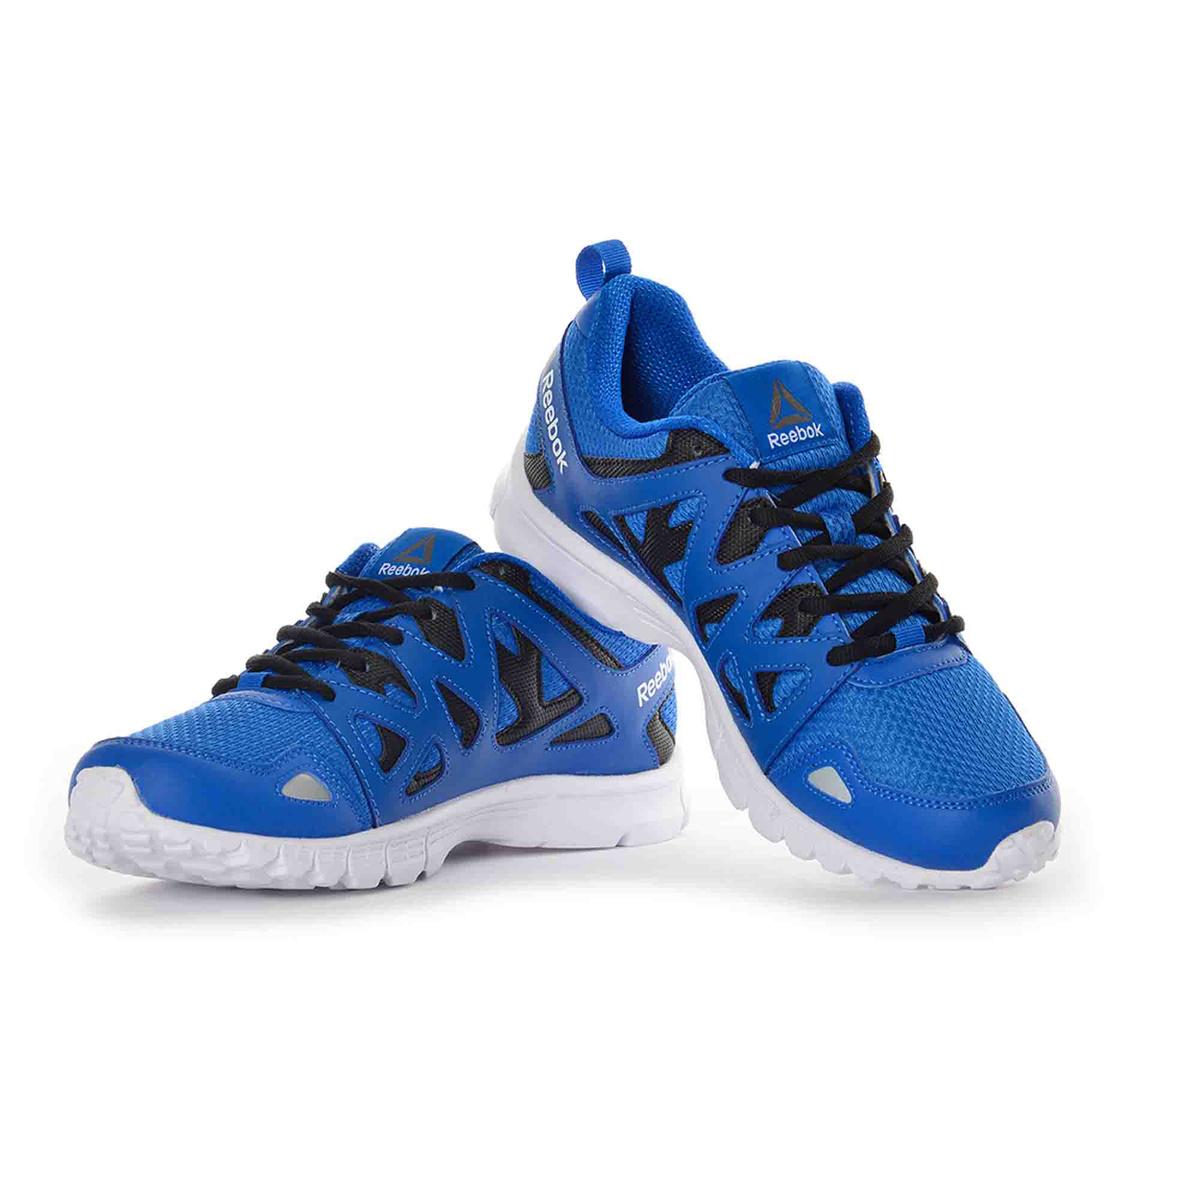 reebok shoes lulu uae - 52% OFF